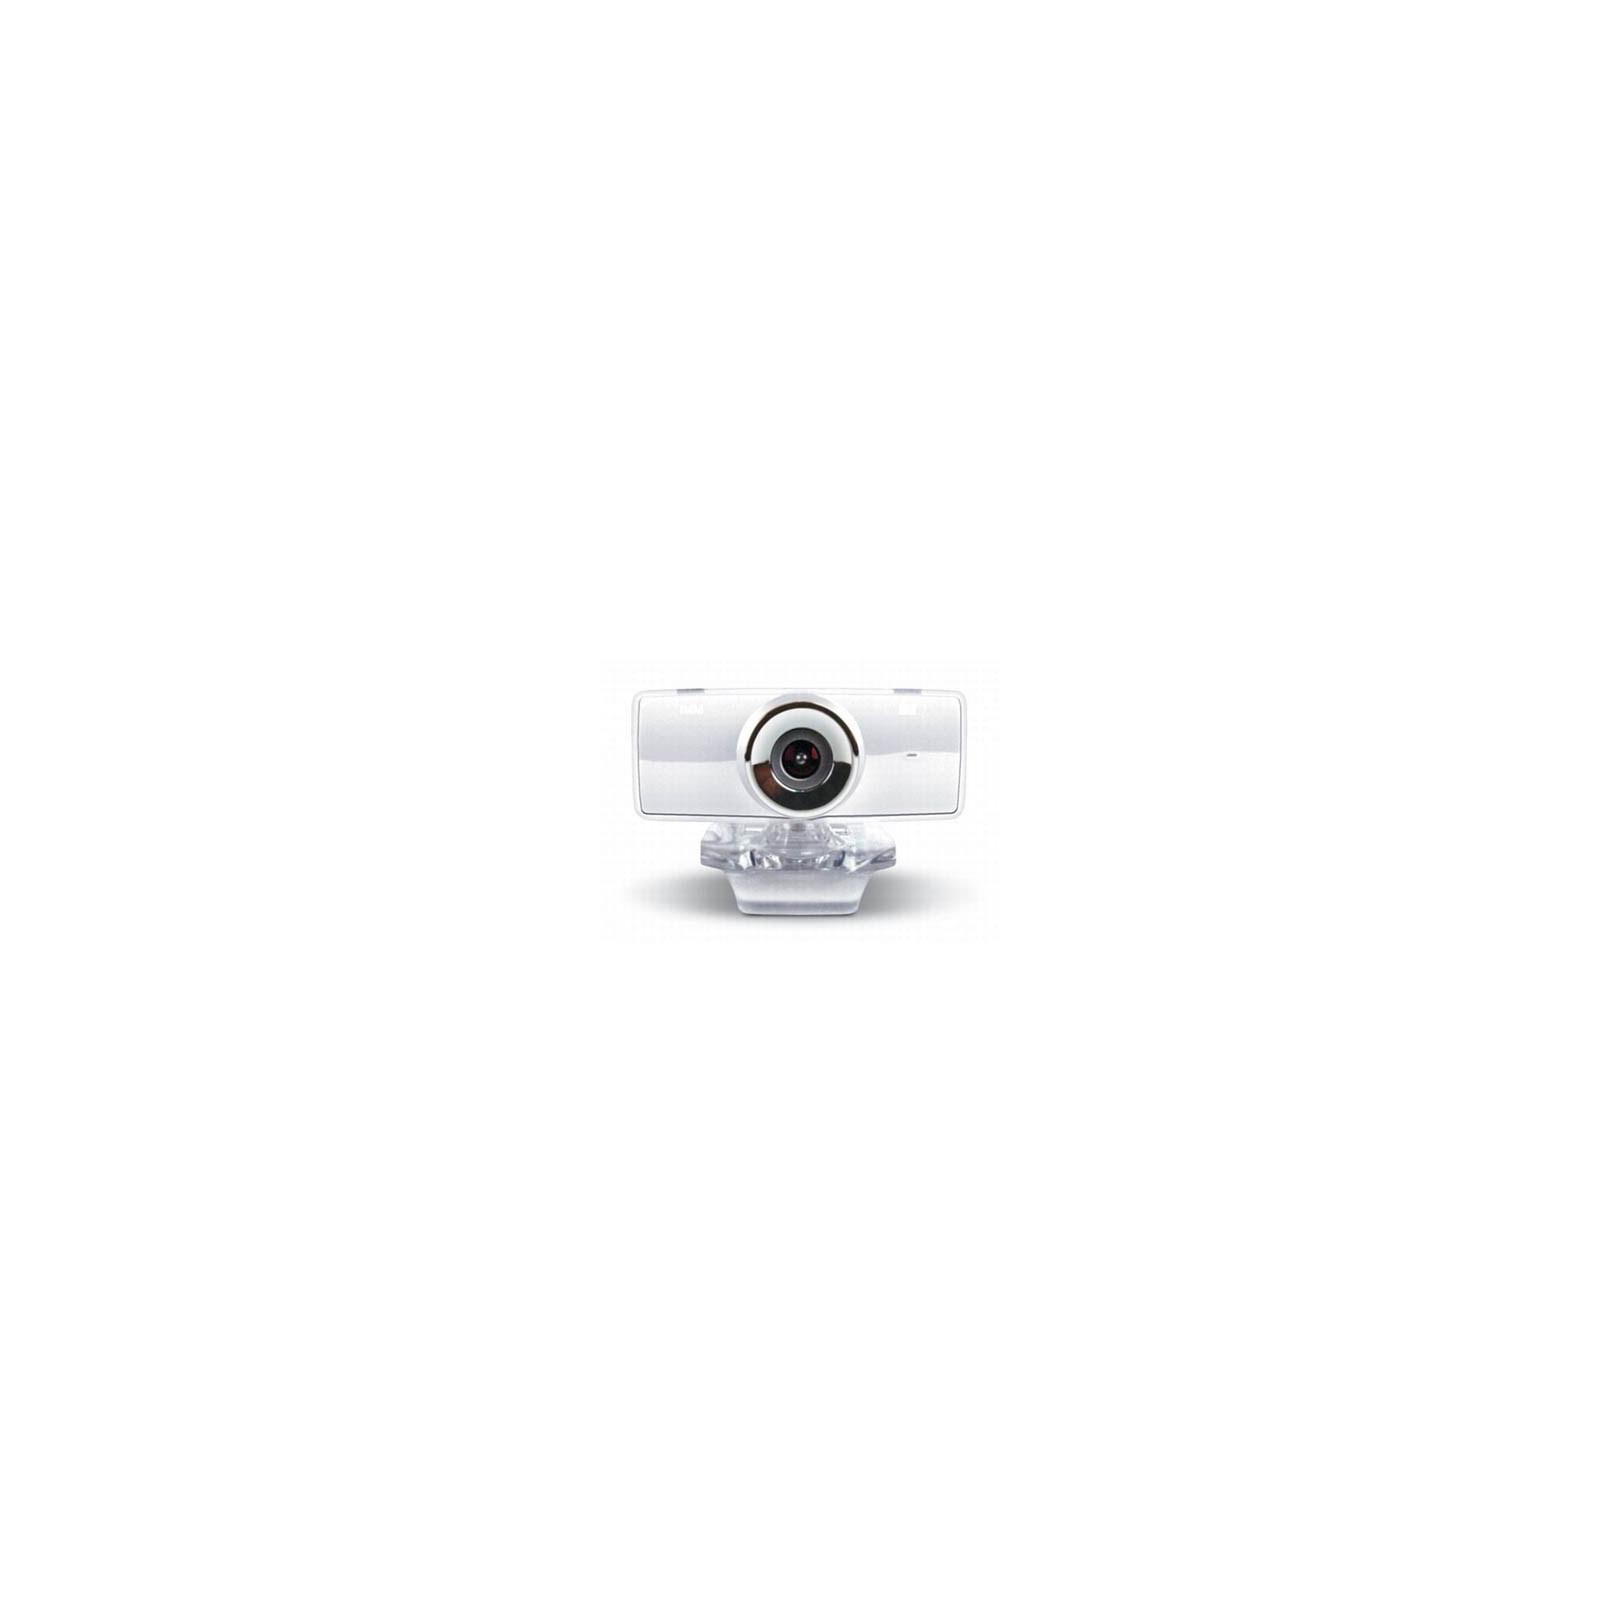 Веб-камера GEMIX F9 white